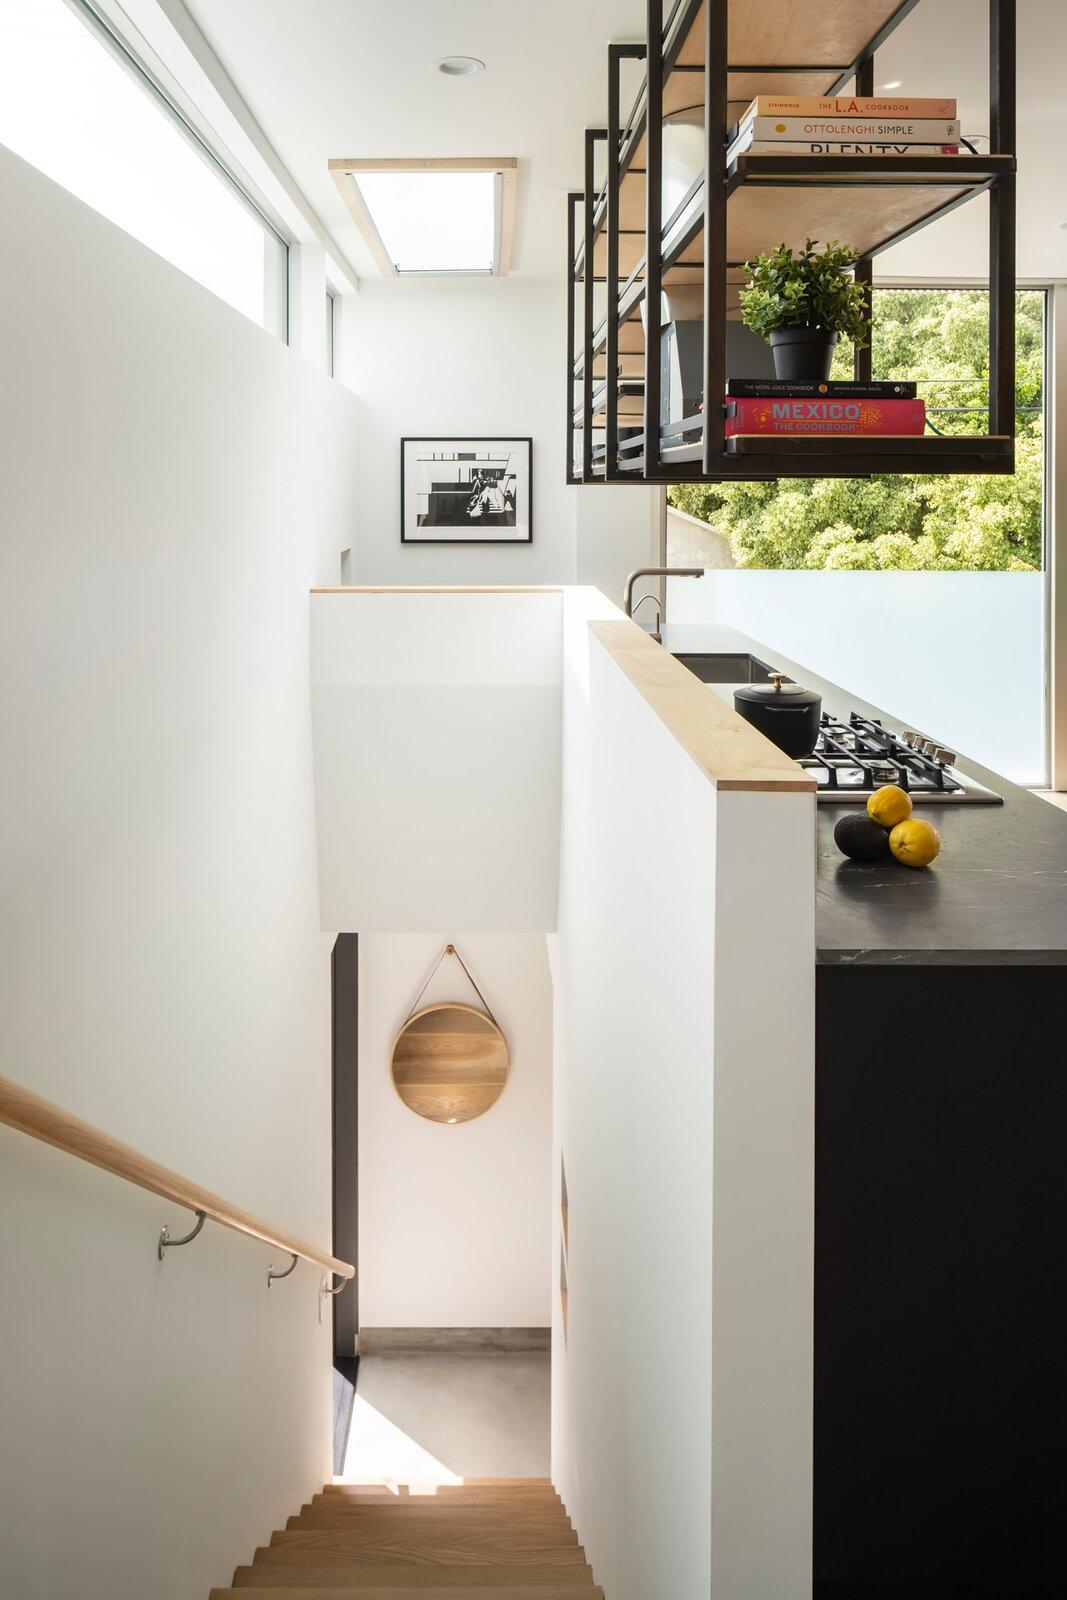 Bau10 Architecture Couer D'Alene stairway and kitchen